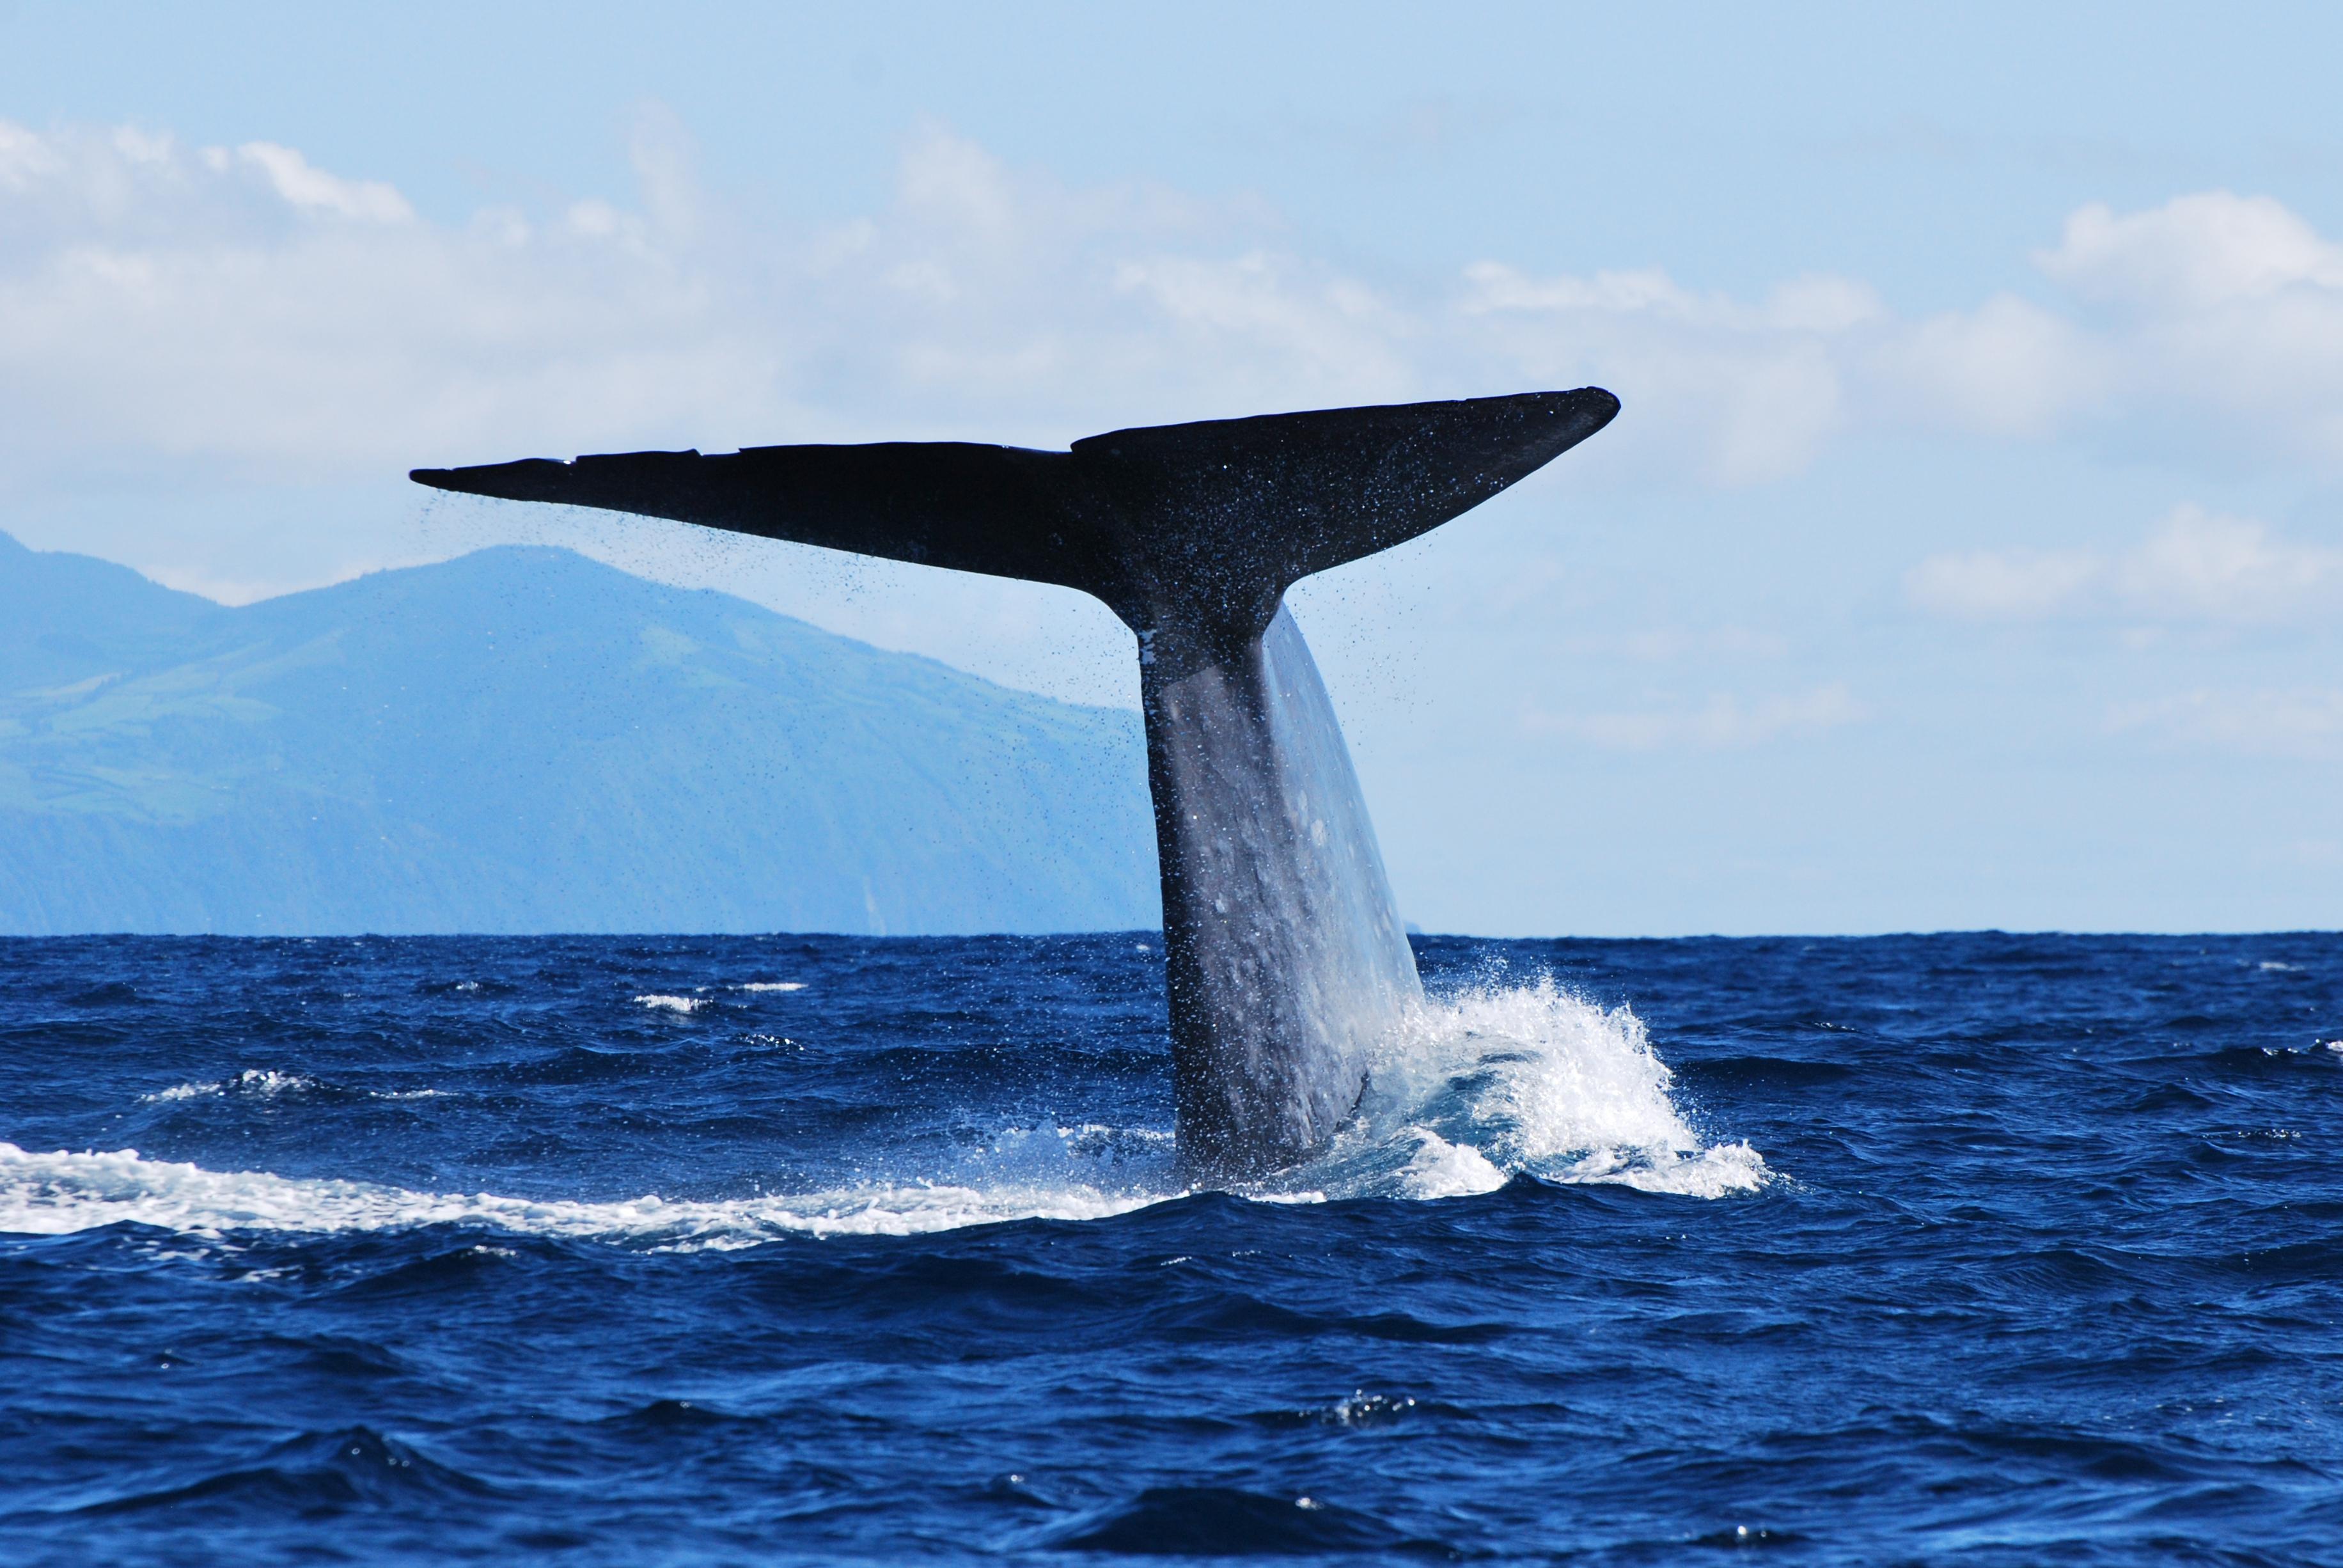 © Miranda van der Linde | Azores Whale Watching Futurismo